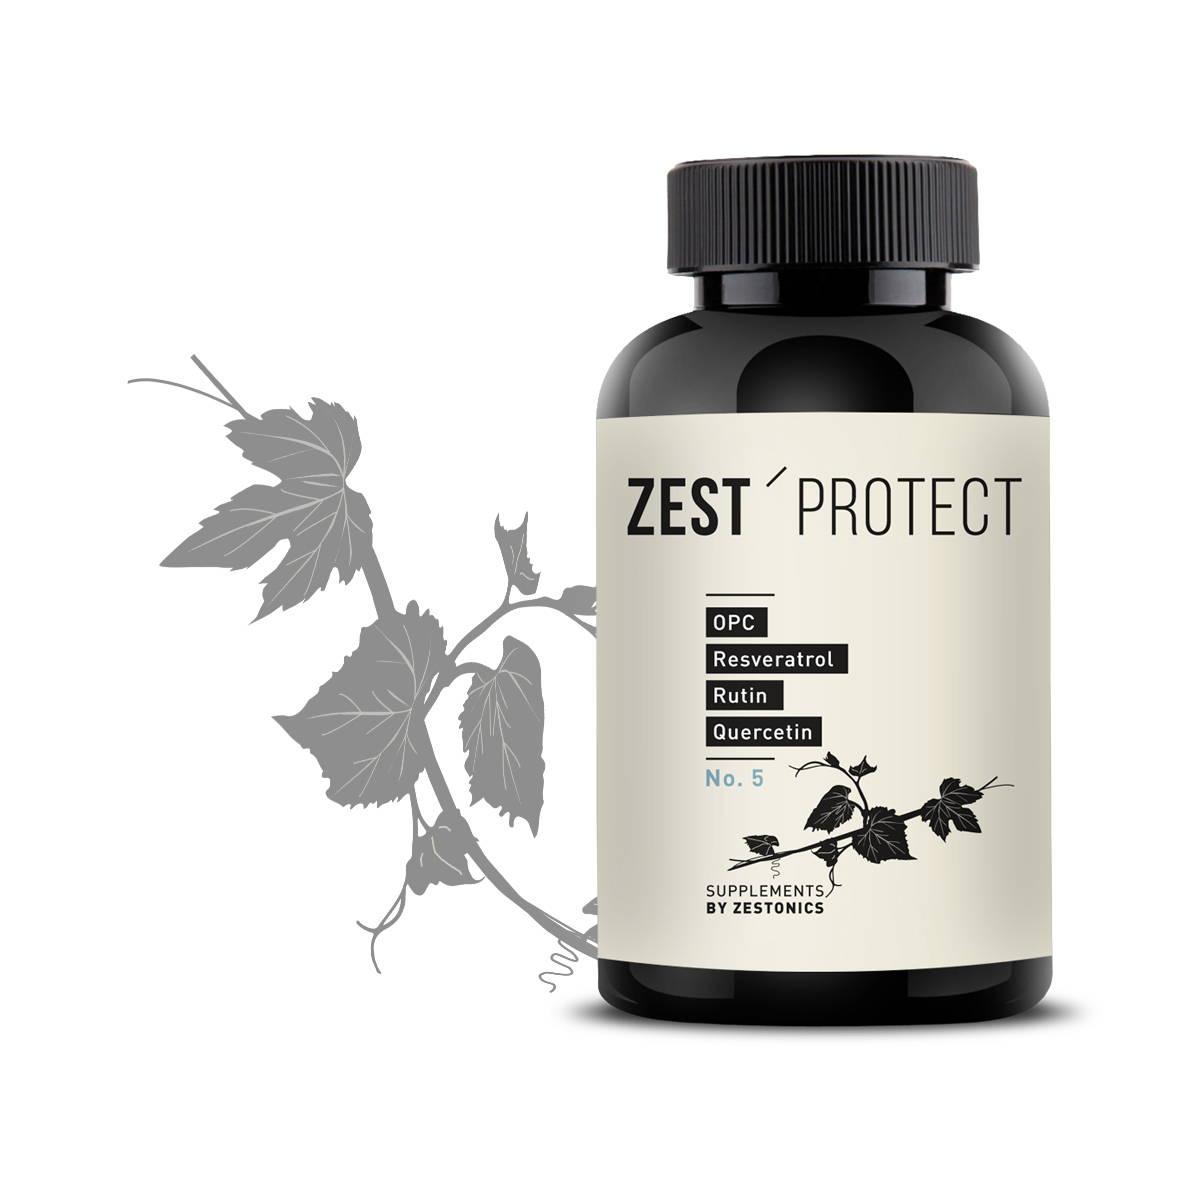 zestonics-zest'protect